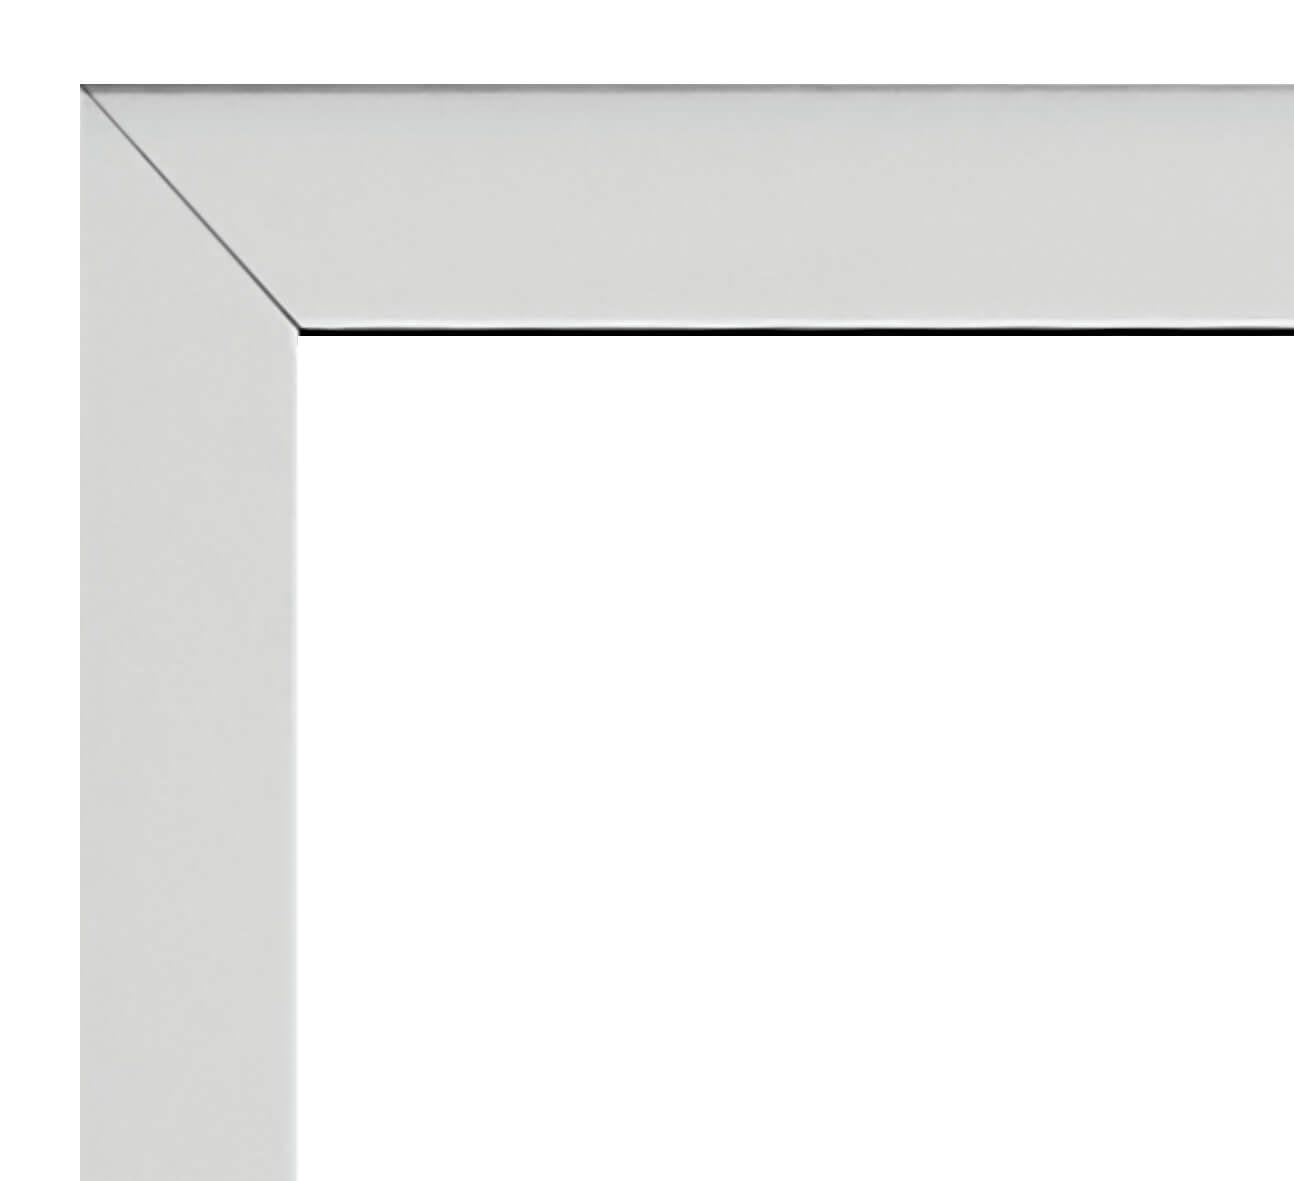 Aluminium Guarnição - 0.60x1.00 Ref. 74.92.634-7 Sasazaki